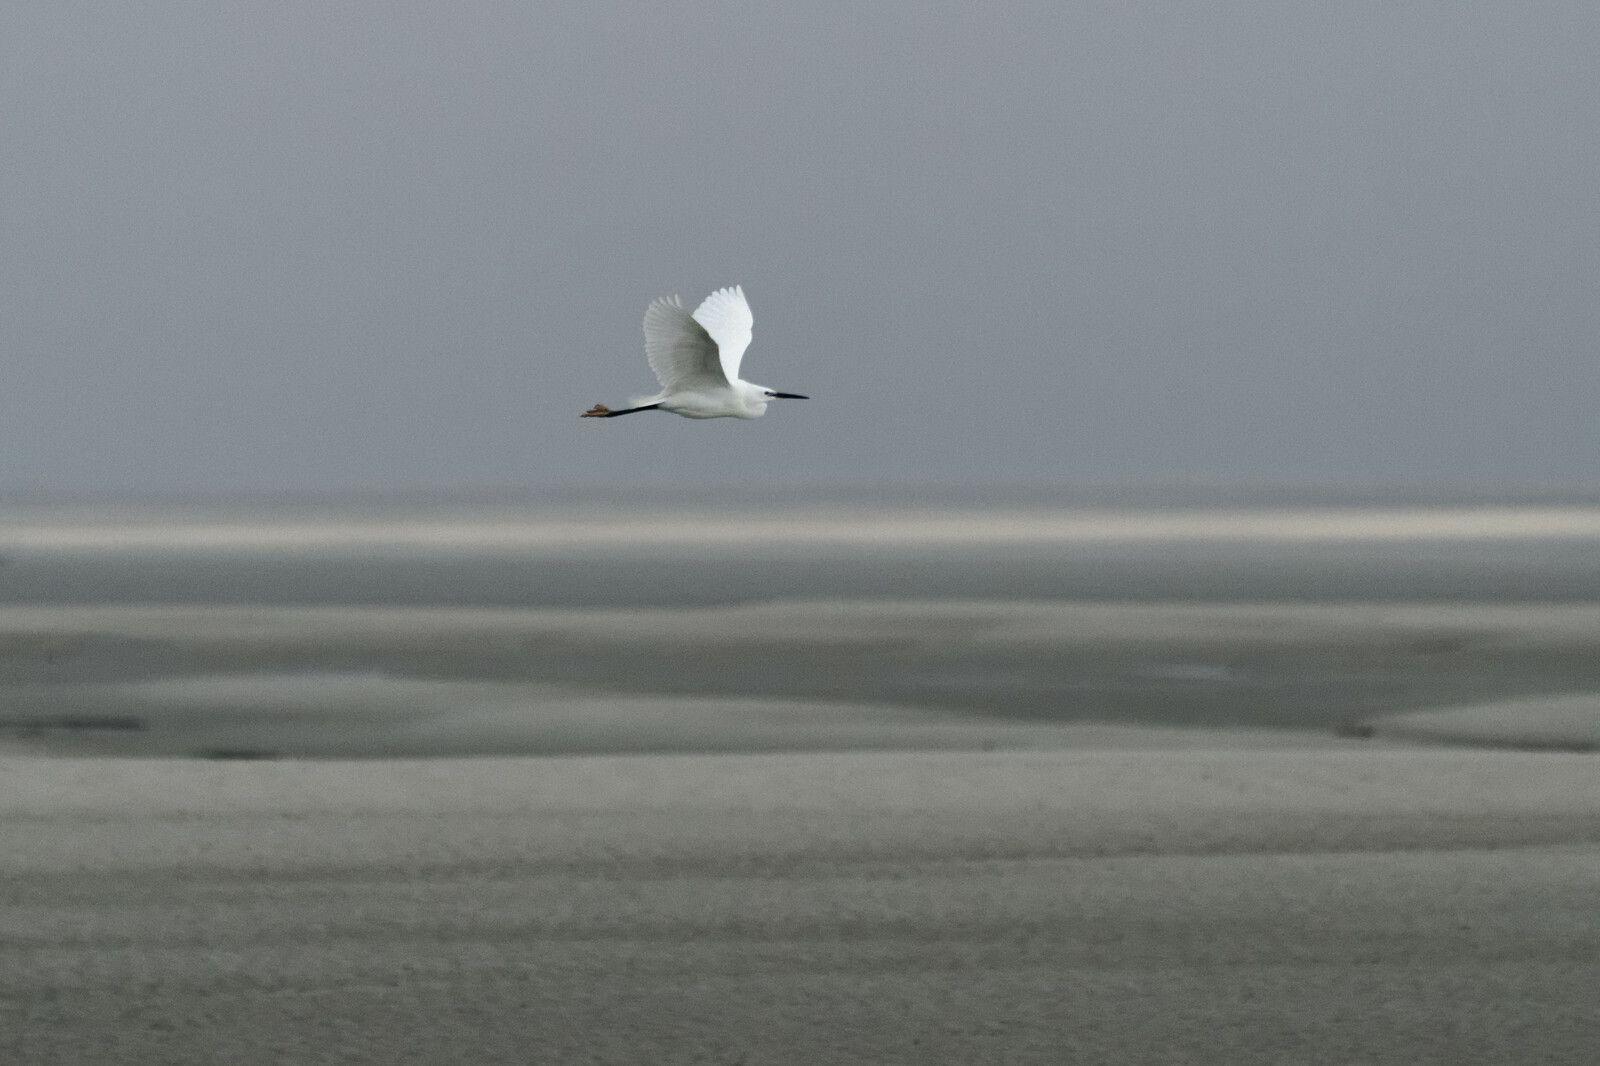 37 - Un aperçu de la Baie de Somme (80)